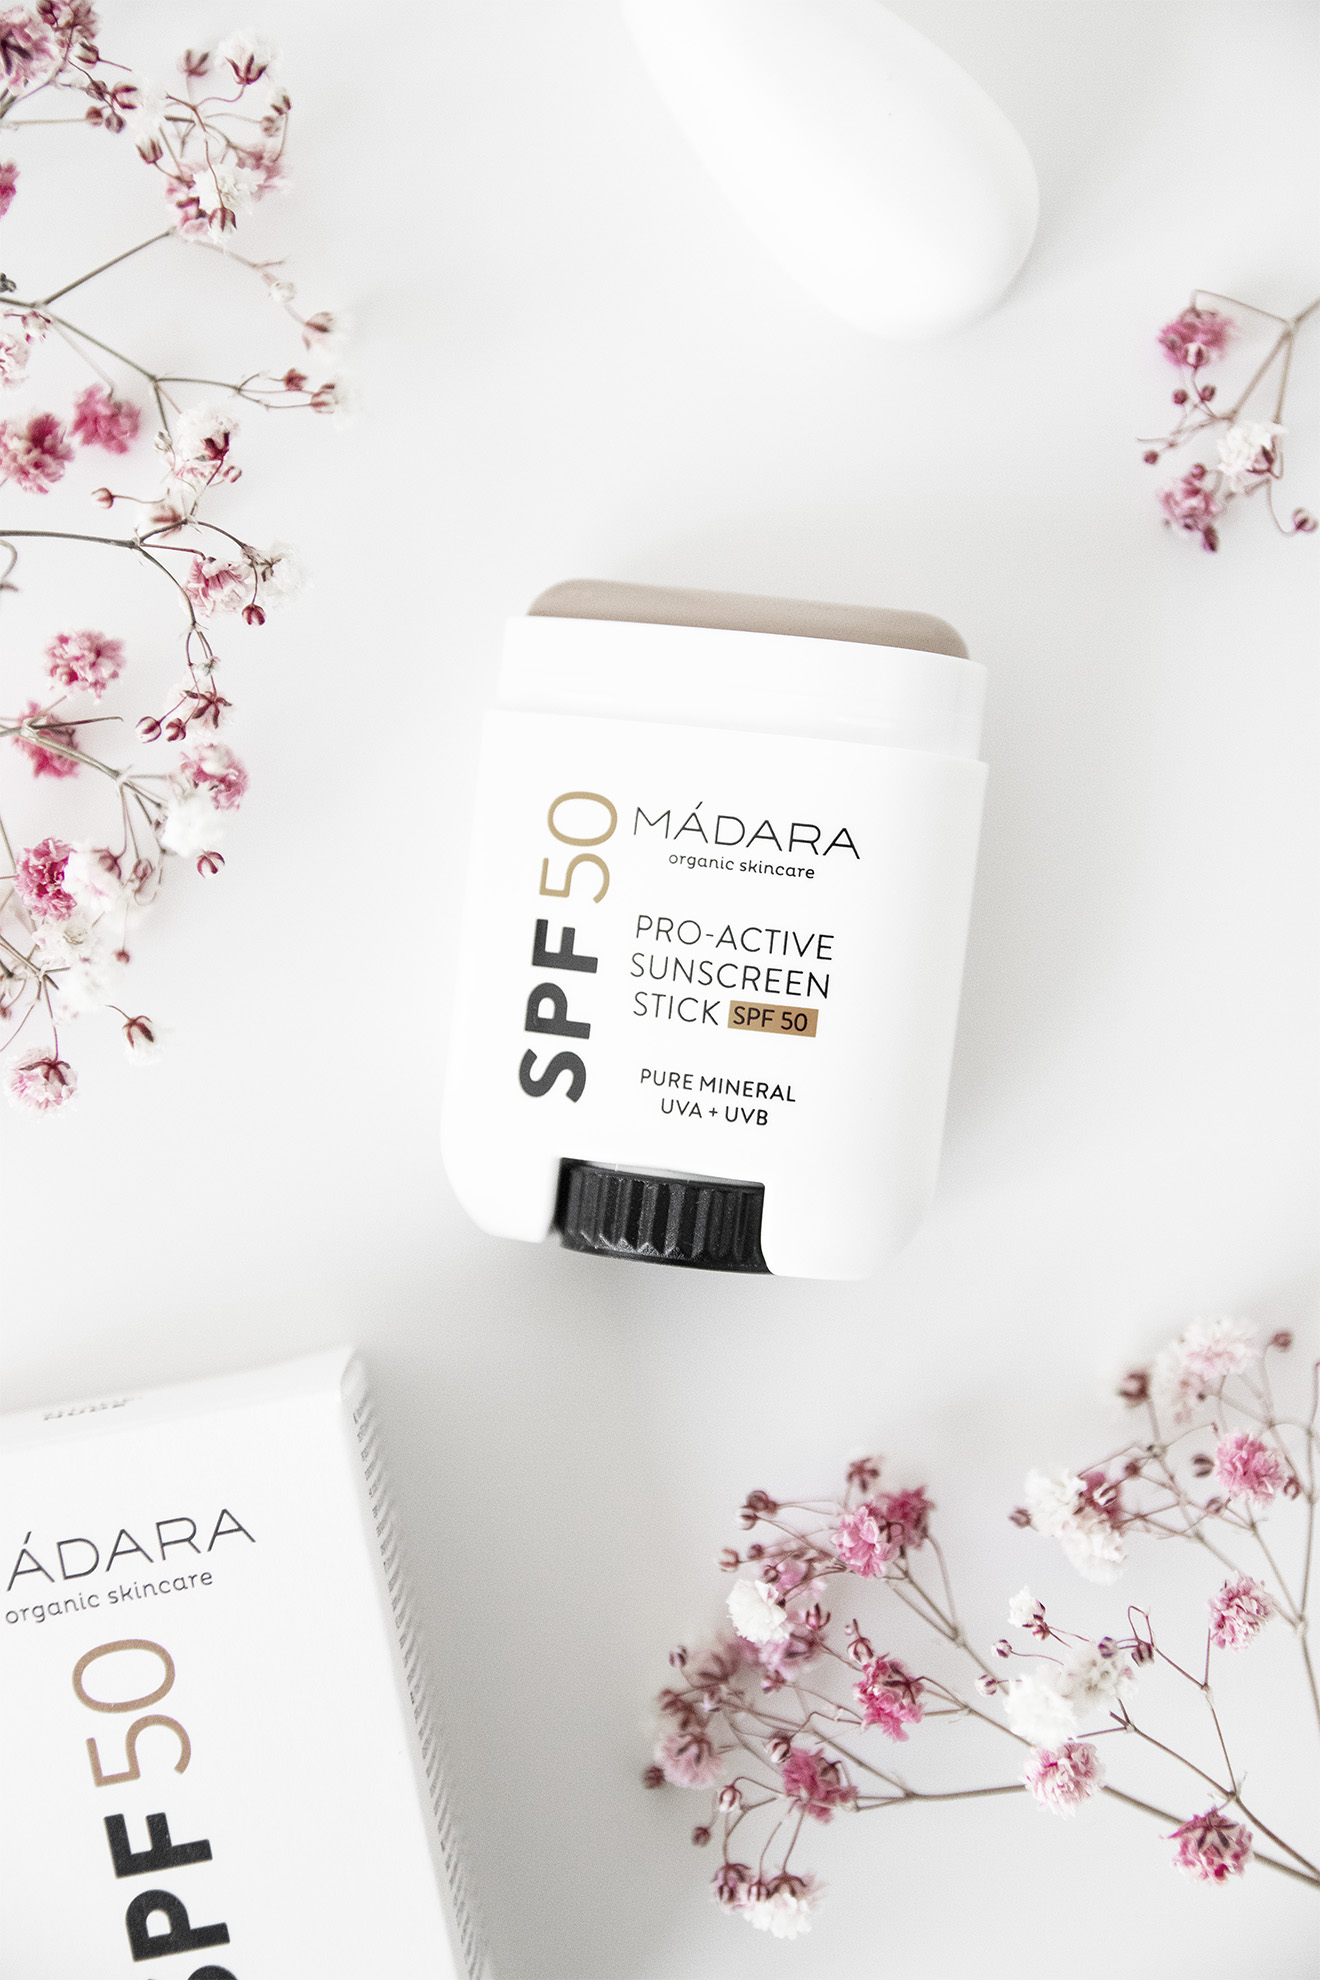 Madara Pro-Active Sunscreen Stick SPF50 Nude